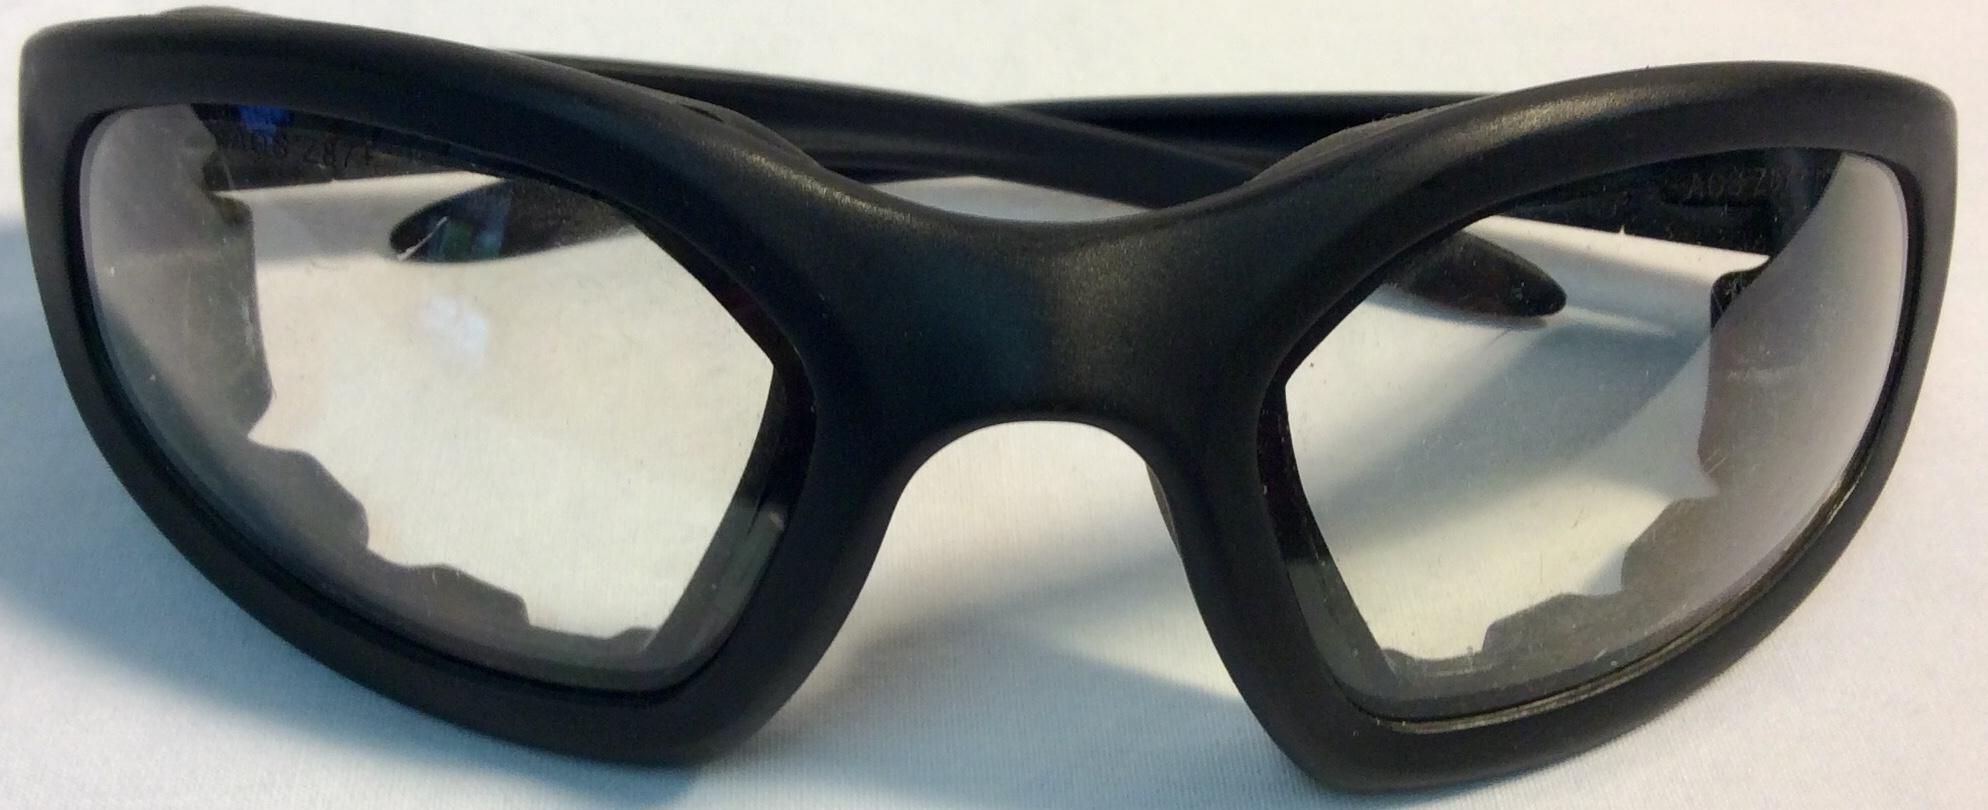 Peltor Eyewear black frame with rubber protection